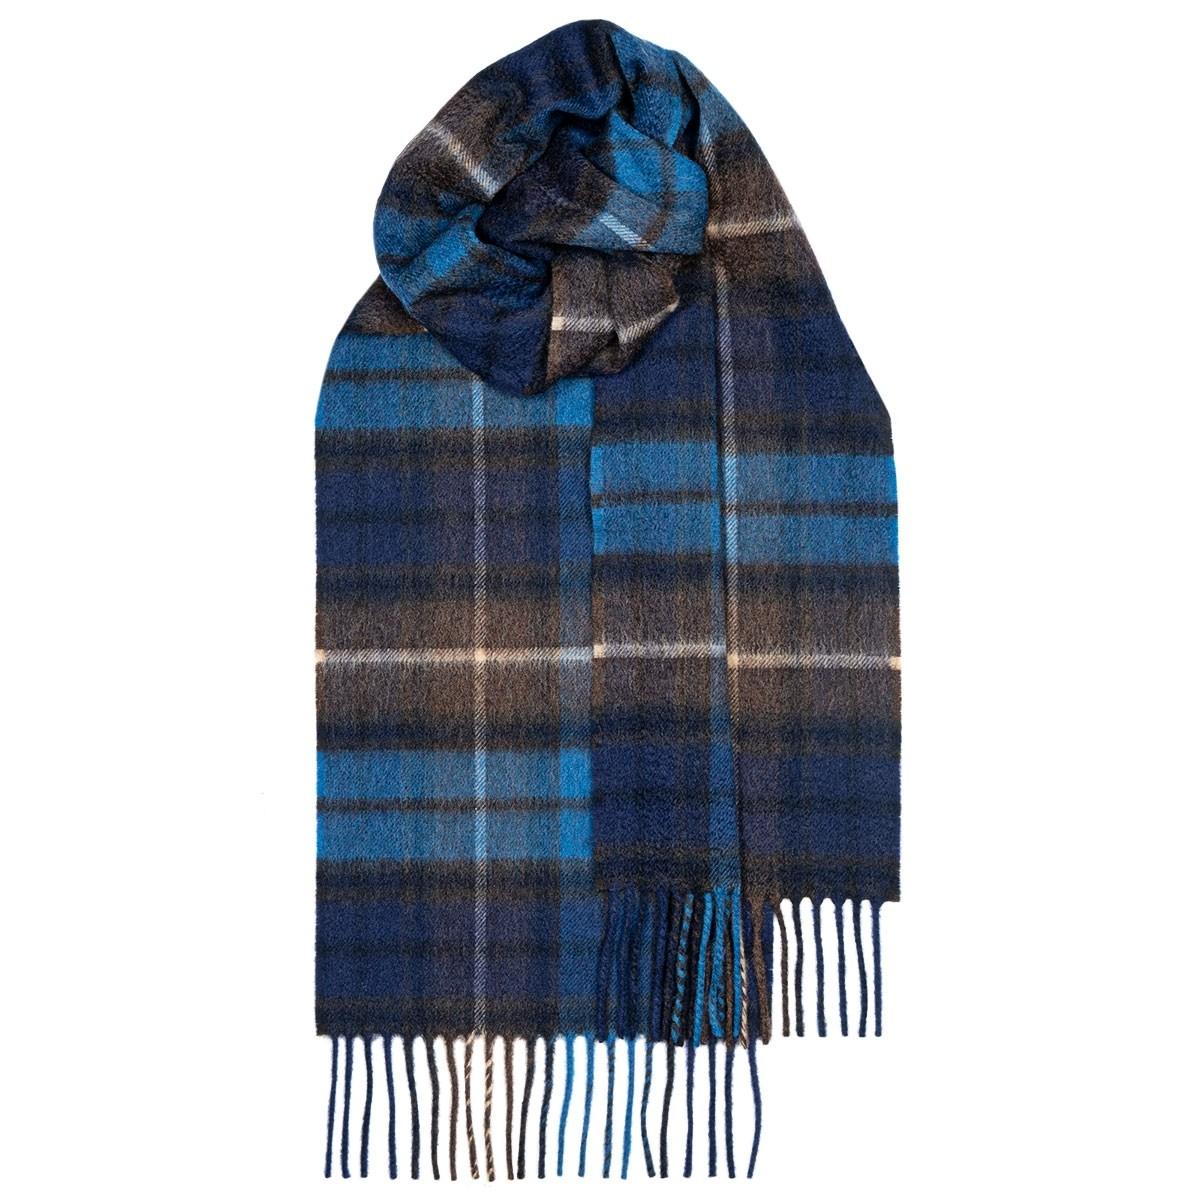 Beau Buchanan Blue Tartan Luxury Cashmere Scarf